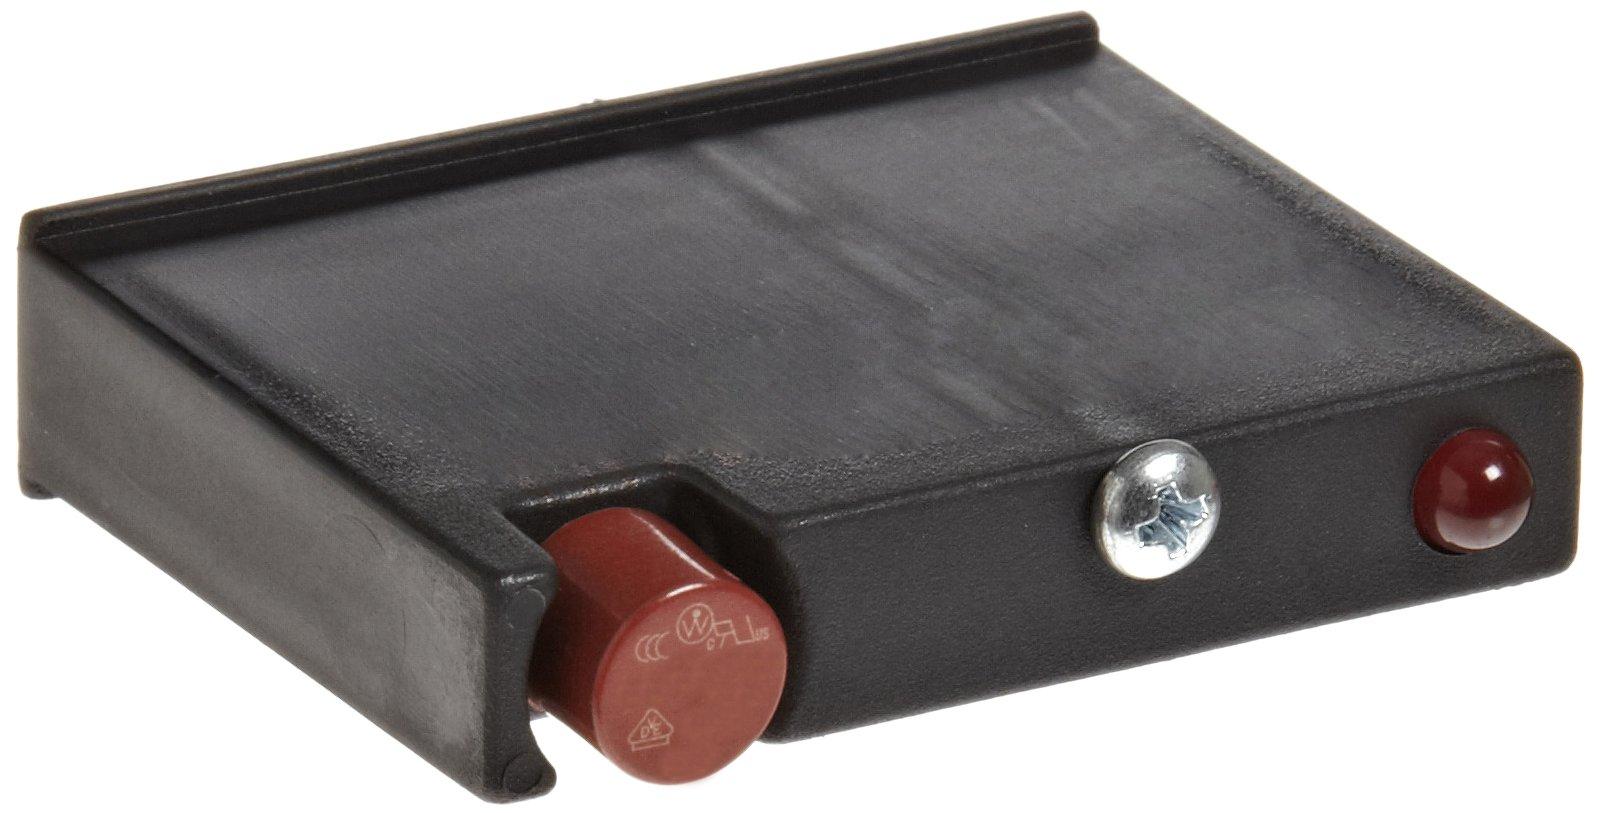 Opto 22 G4OAC5A5 G4 AC Output, 24-280 VAC, 5 VDC Logic, 4000 Vrms I/O Isolation, 12 mA Logic Input Current